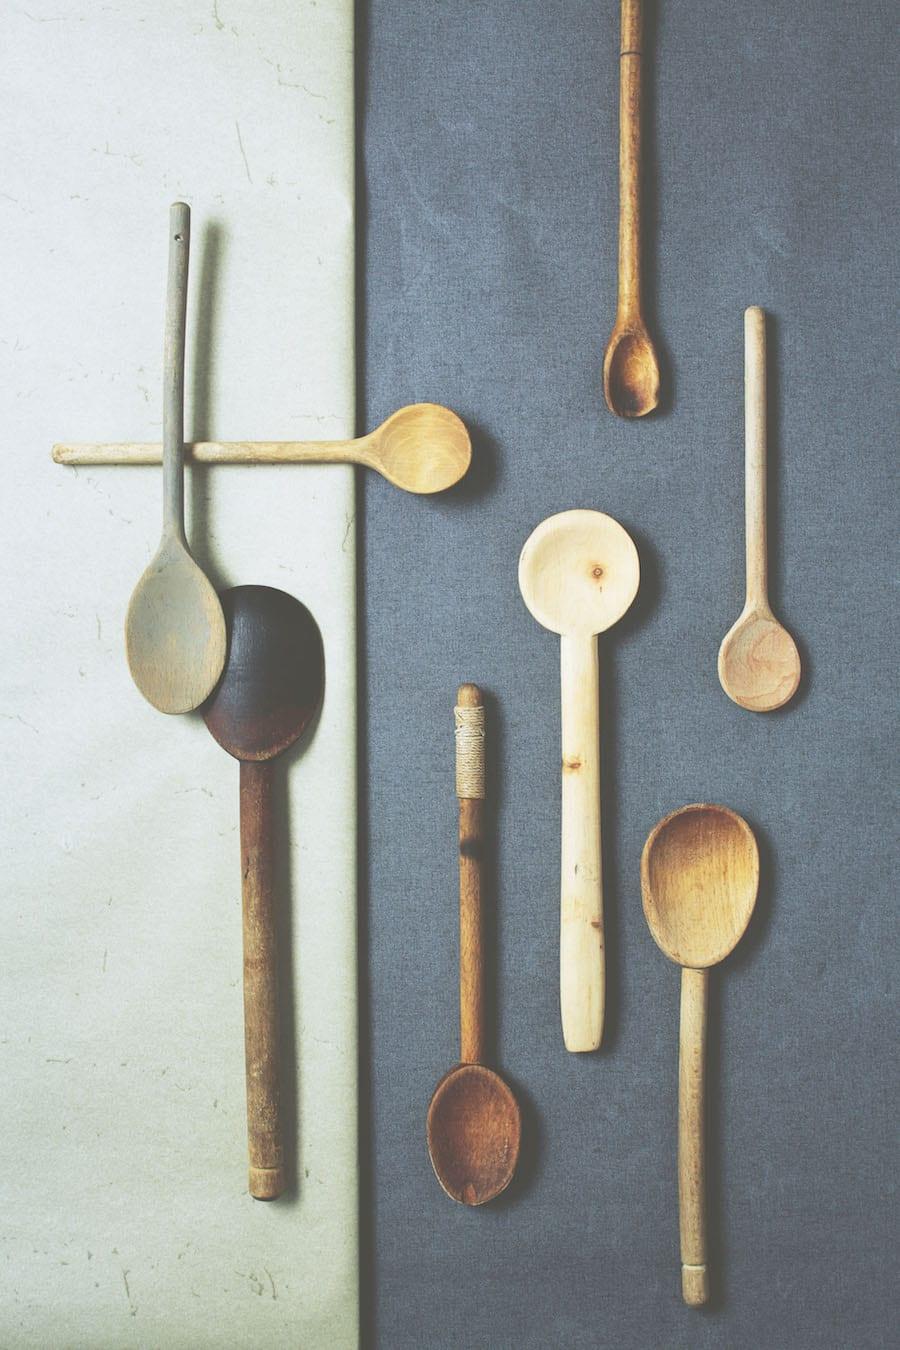 Gli strumenti della cucina moderna - Tim Haywar - Guido Tommasi